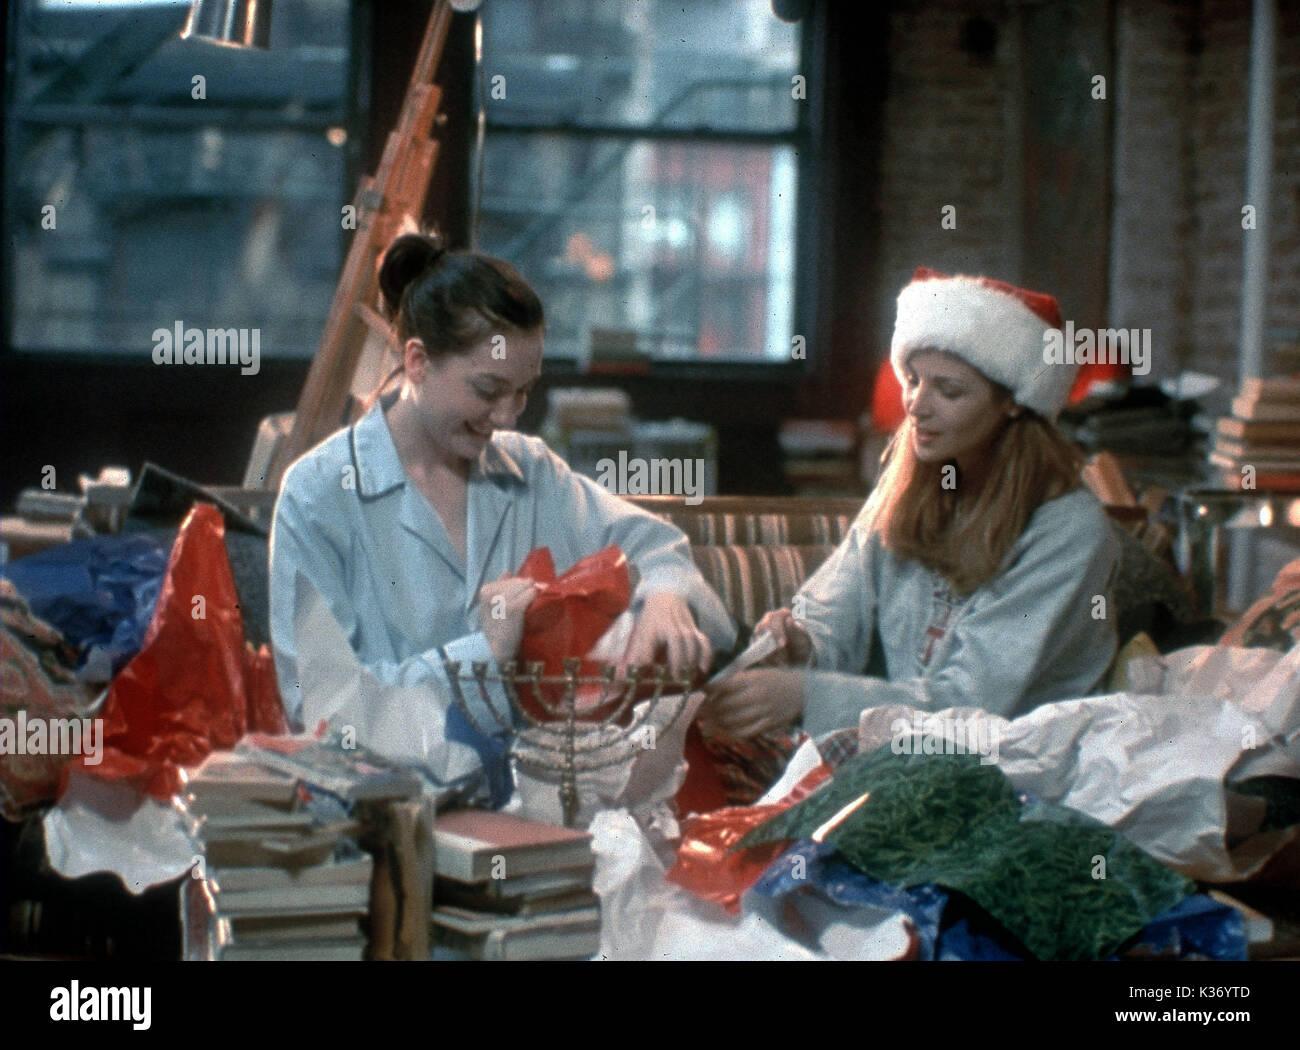 KISSING JESSICA STEIN HEATHER JUERGENSEN AND JENNIFER WESTFELDT CHRISTMAS/HANNUKAH AN EDEN WURMFELD FILM     Date: 2001 - Stock Image